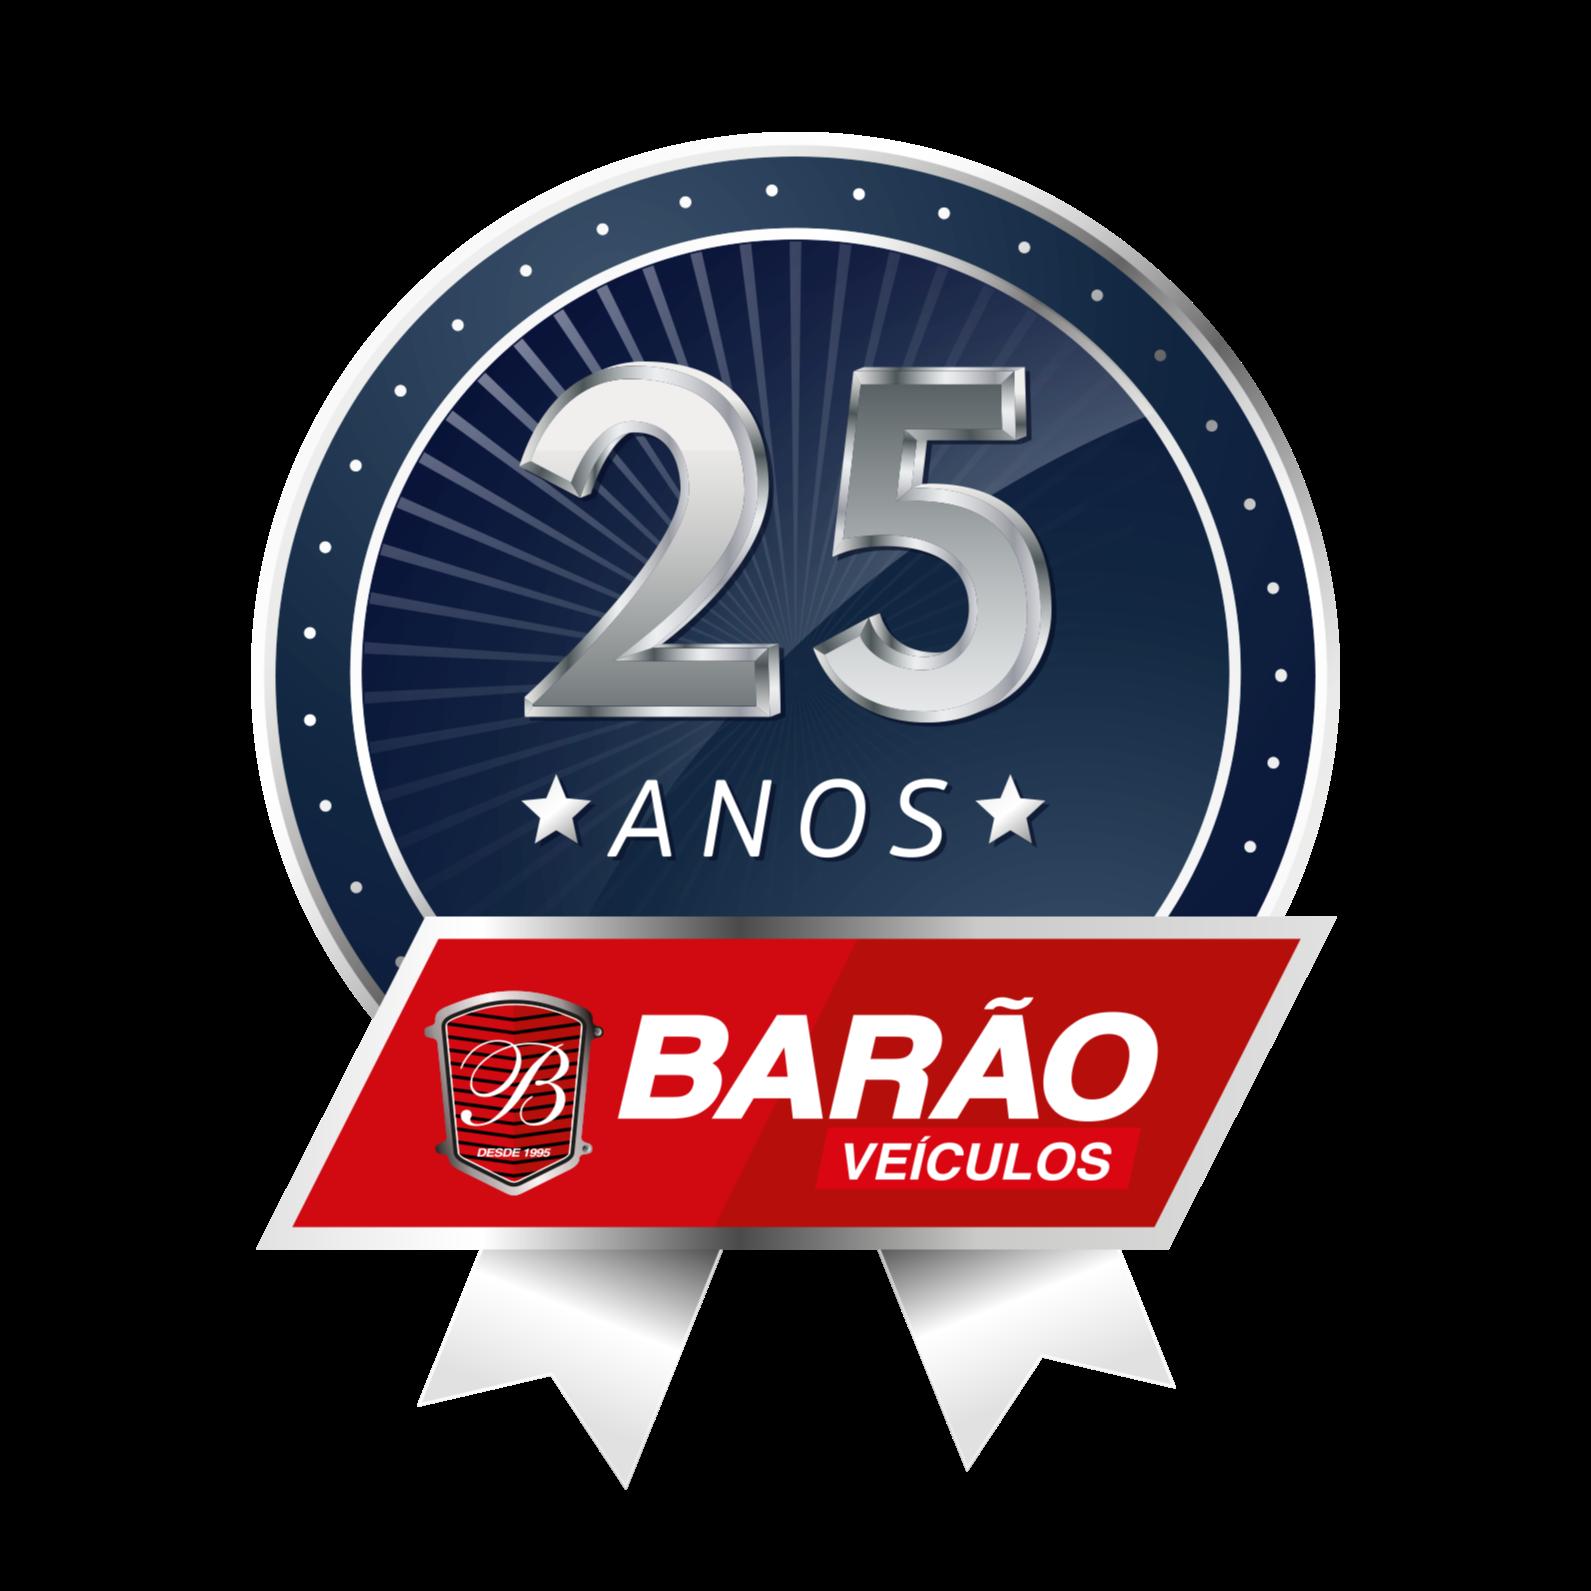 @baraoveiculos Profile Image | Linktree